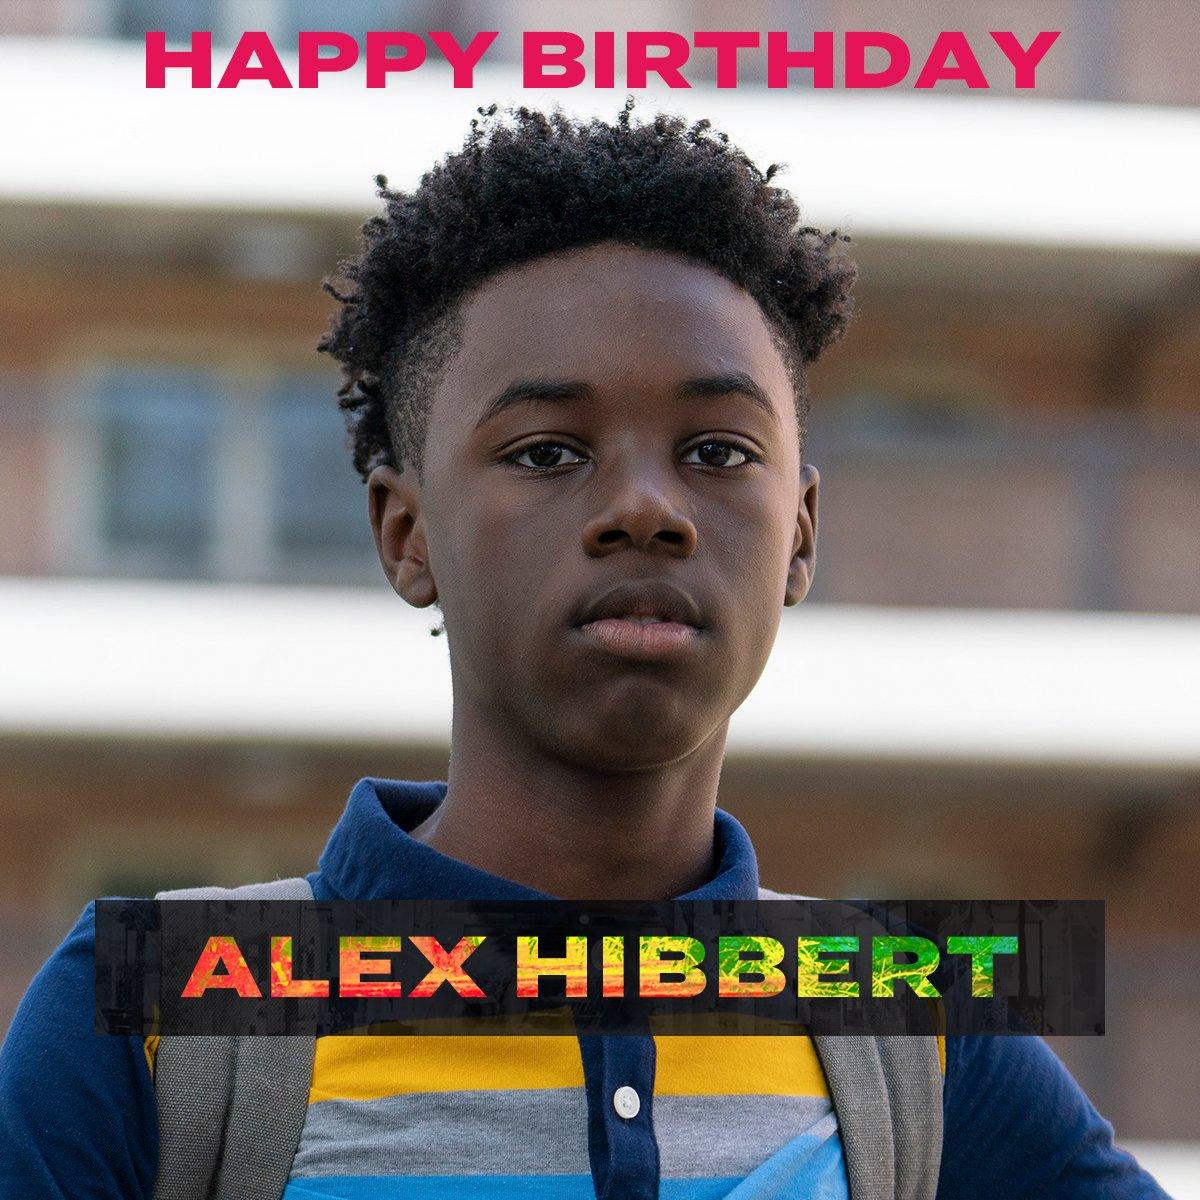 Sendin' love to Alex Hibbert for his birthday today! ❤️🎉